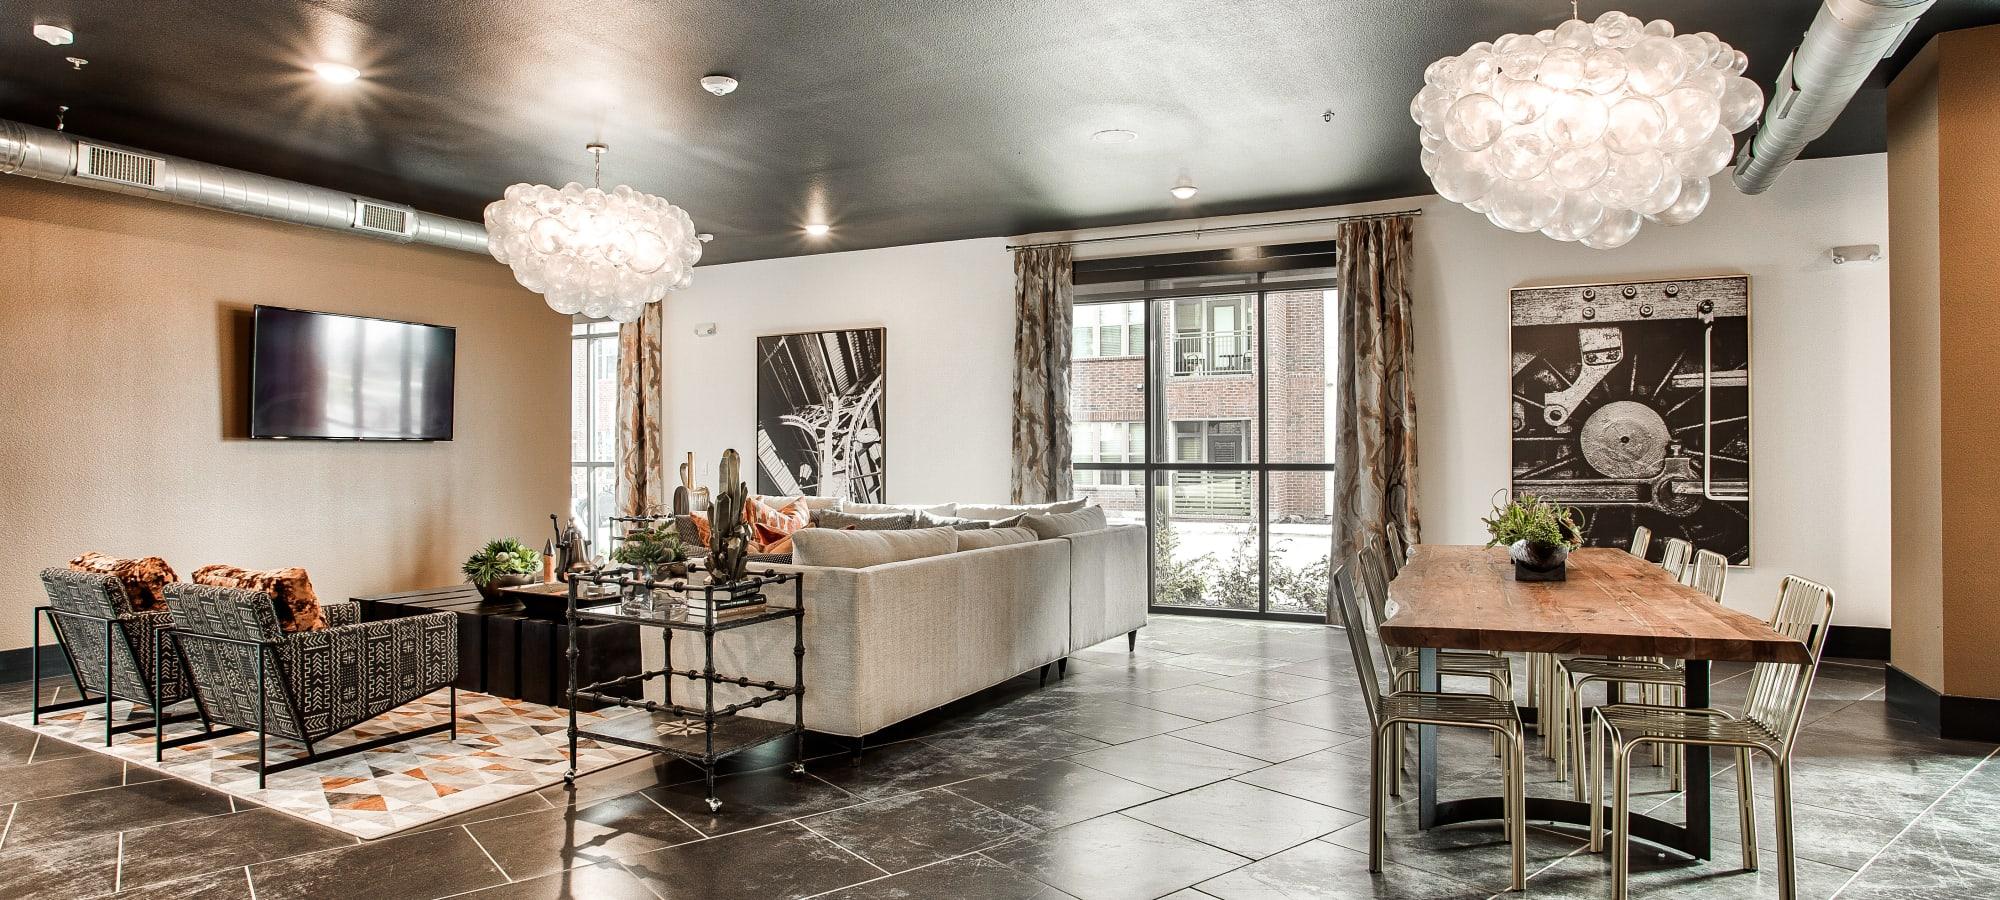 Two99 Monroe apartments in Roanoke, Texas